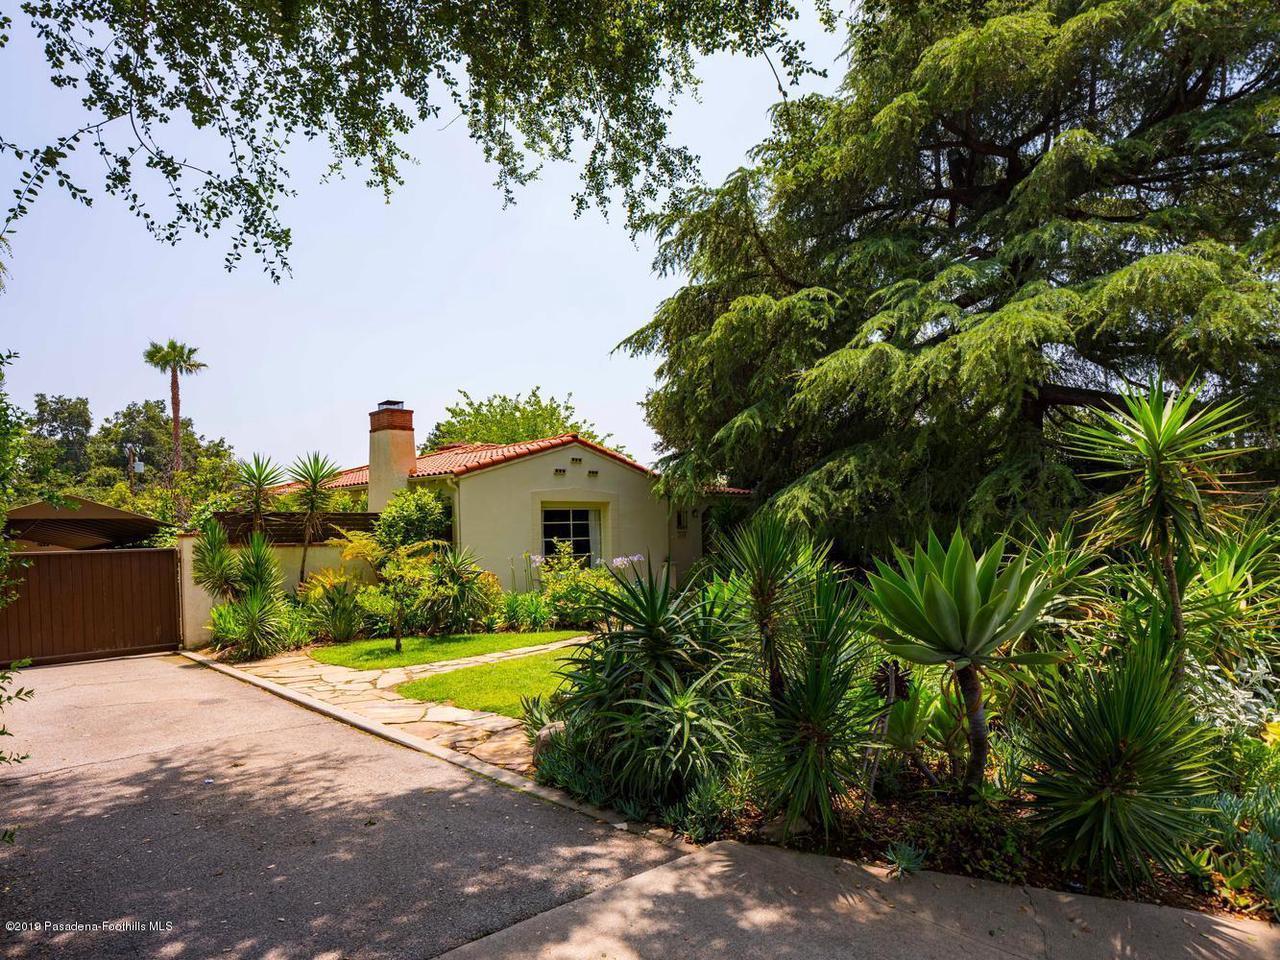 Photo of 928 EAST PALM STREET, Altadena, CA 91001